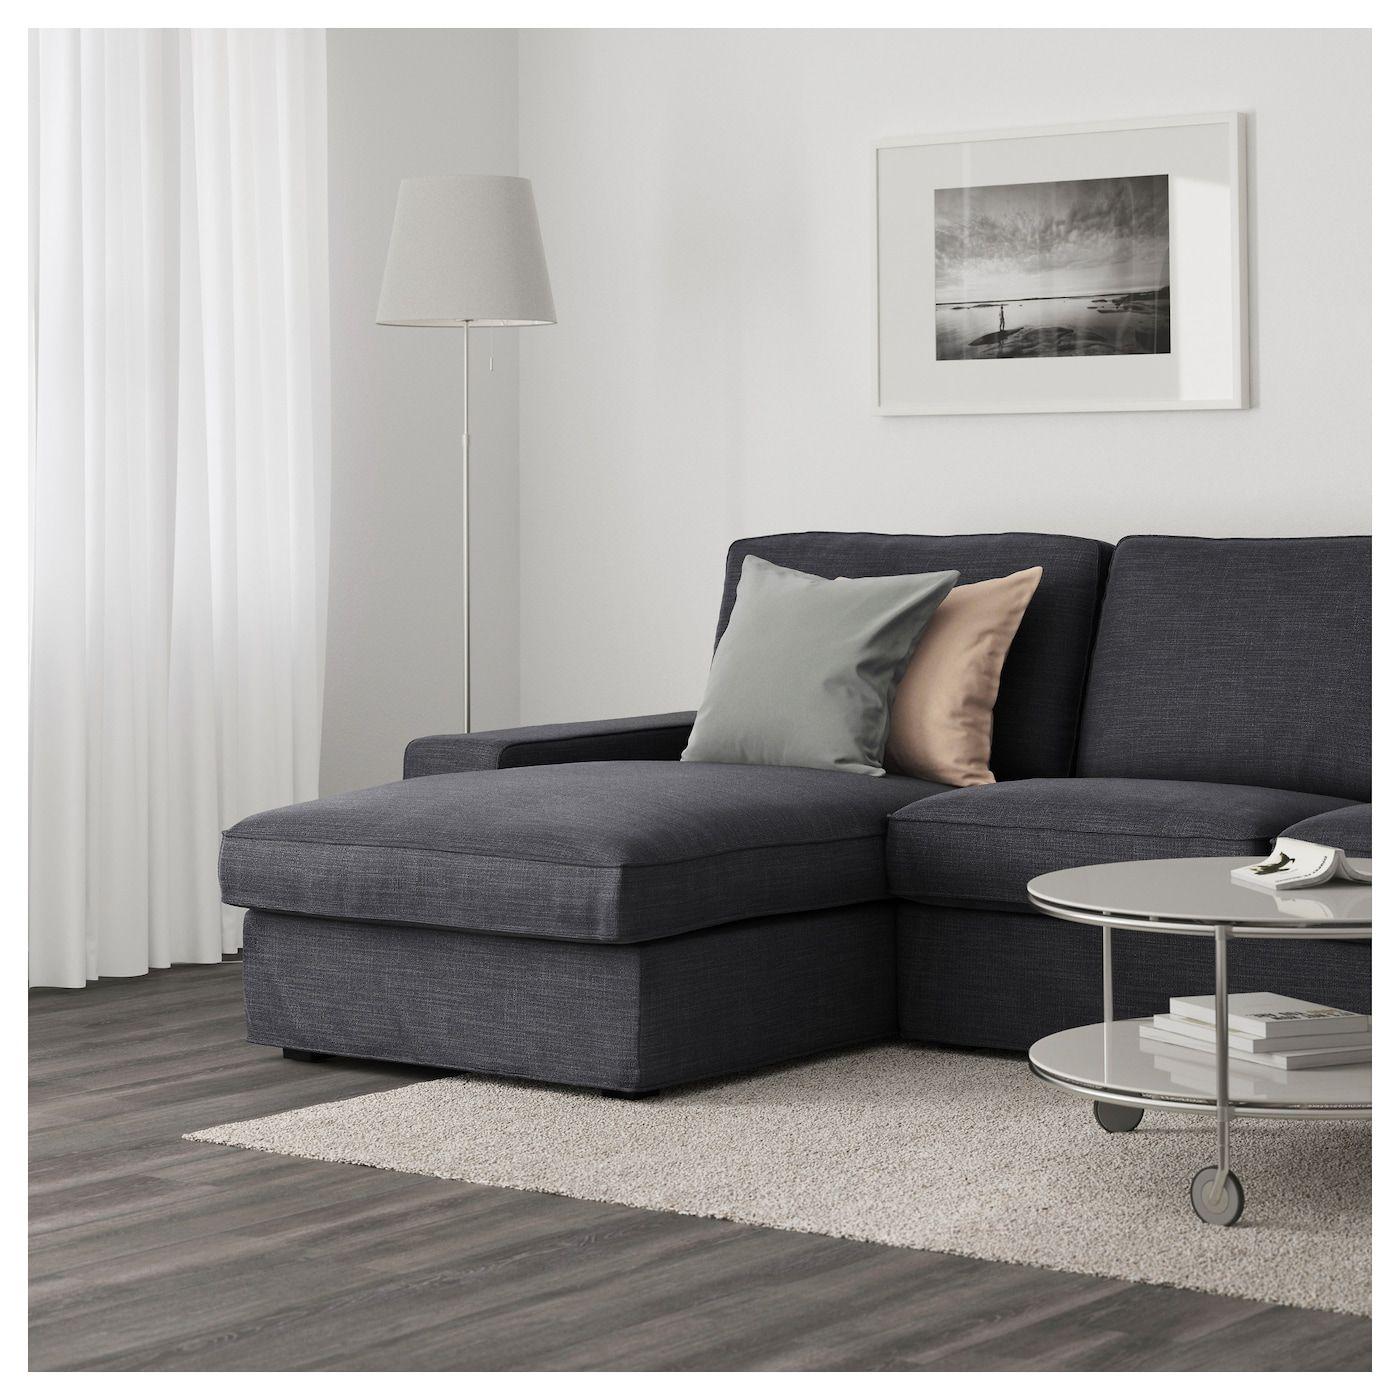 Kivik 3er Sofa Hillared Mit Recamiere Anthrazit 3er Sofa Chaiselongue Sofa Design